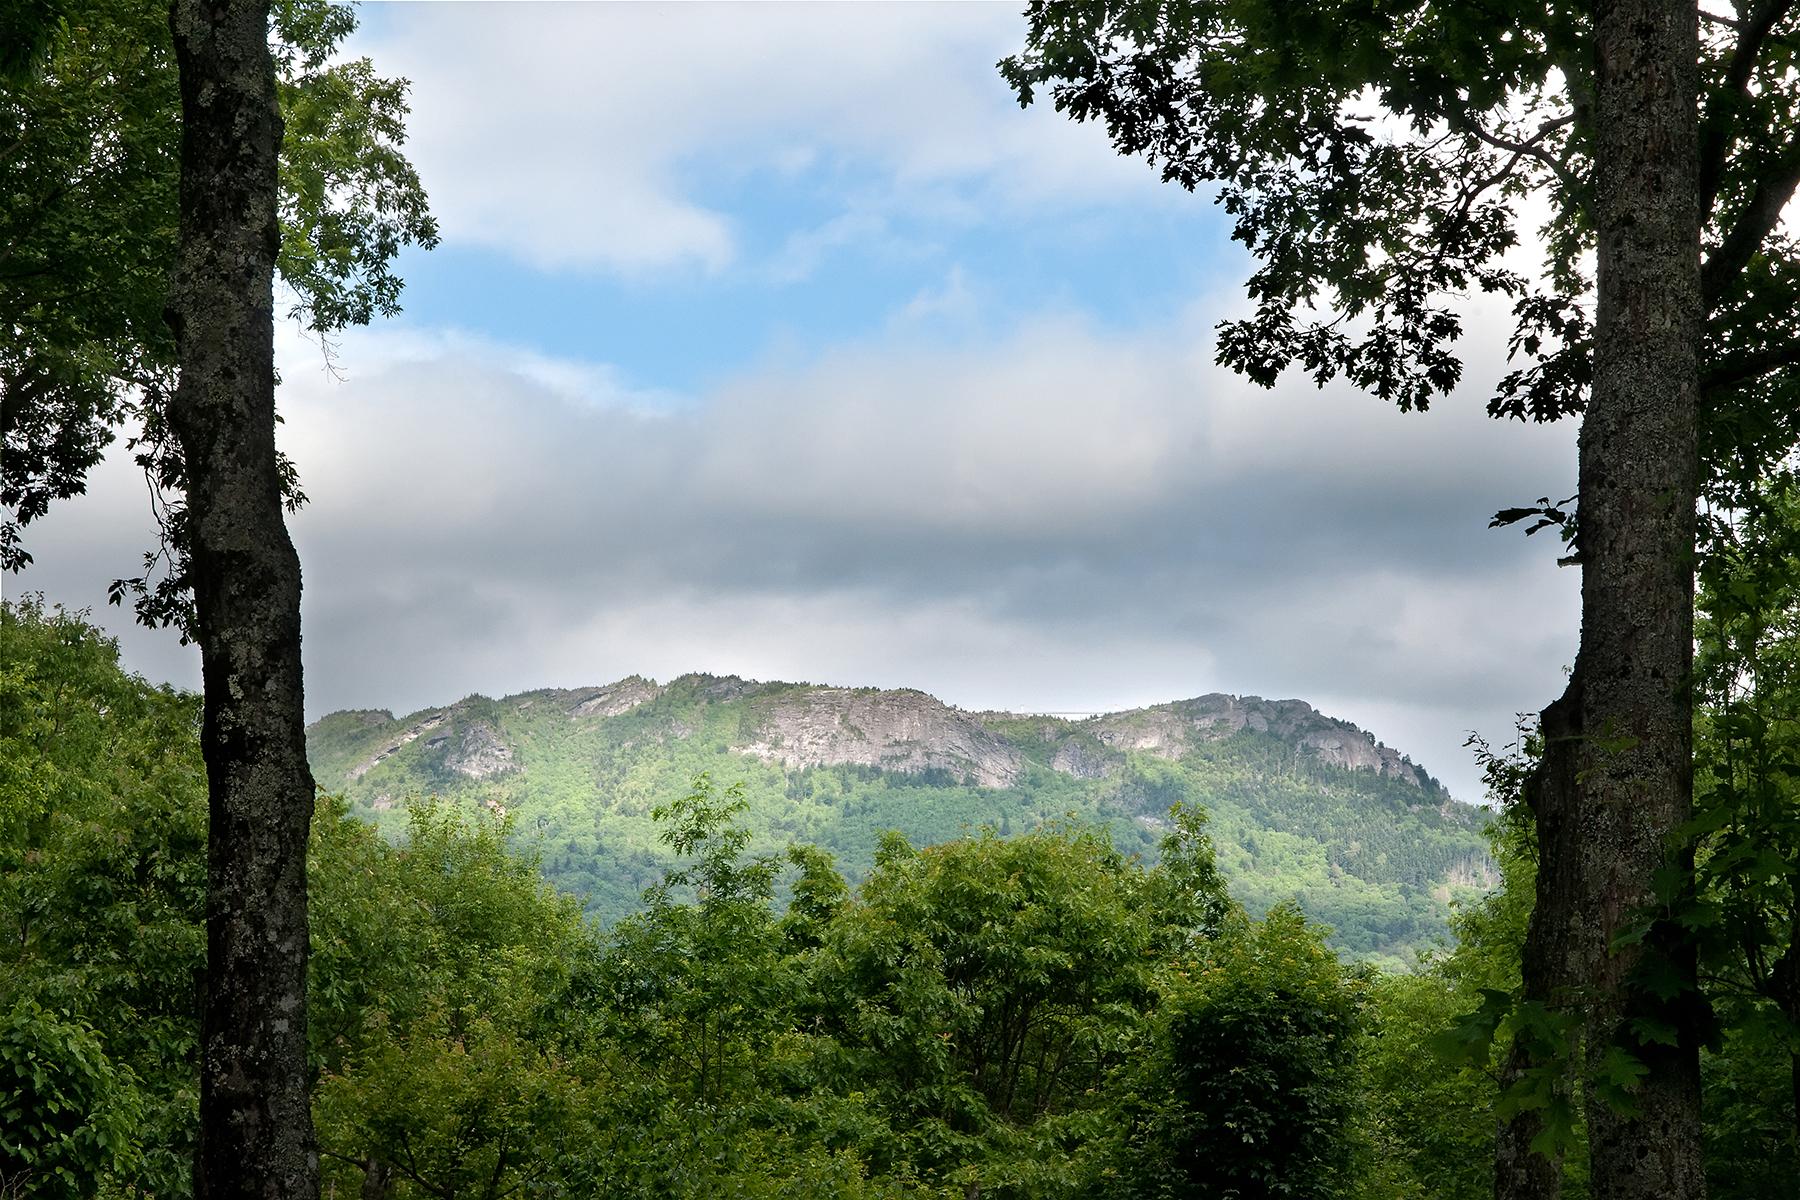 Land for Sale at LINVILLE RIDGE - SPLIT ROCK ESTATES 1709 Forest Ridge Dr 17, Linville, North Carolina 28646 United States